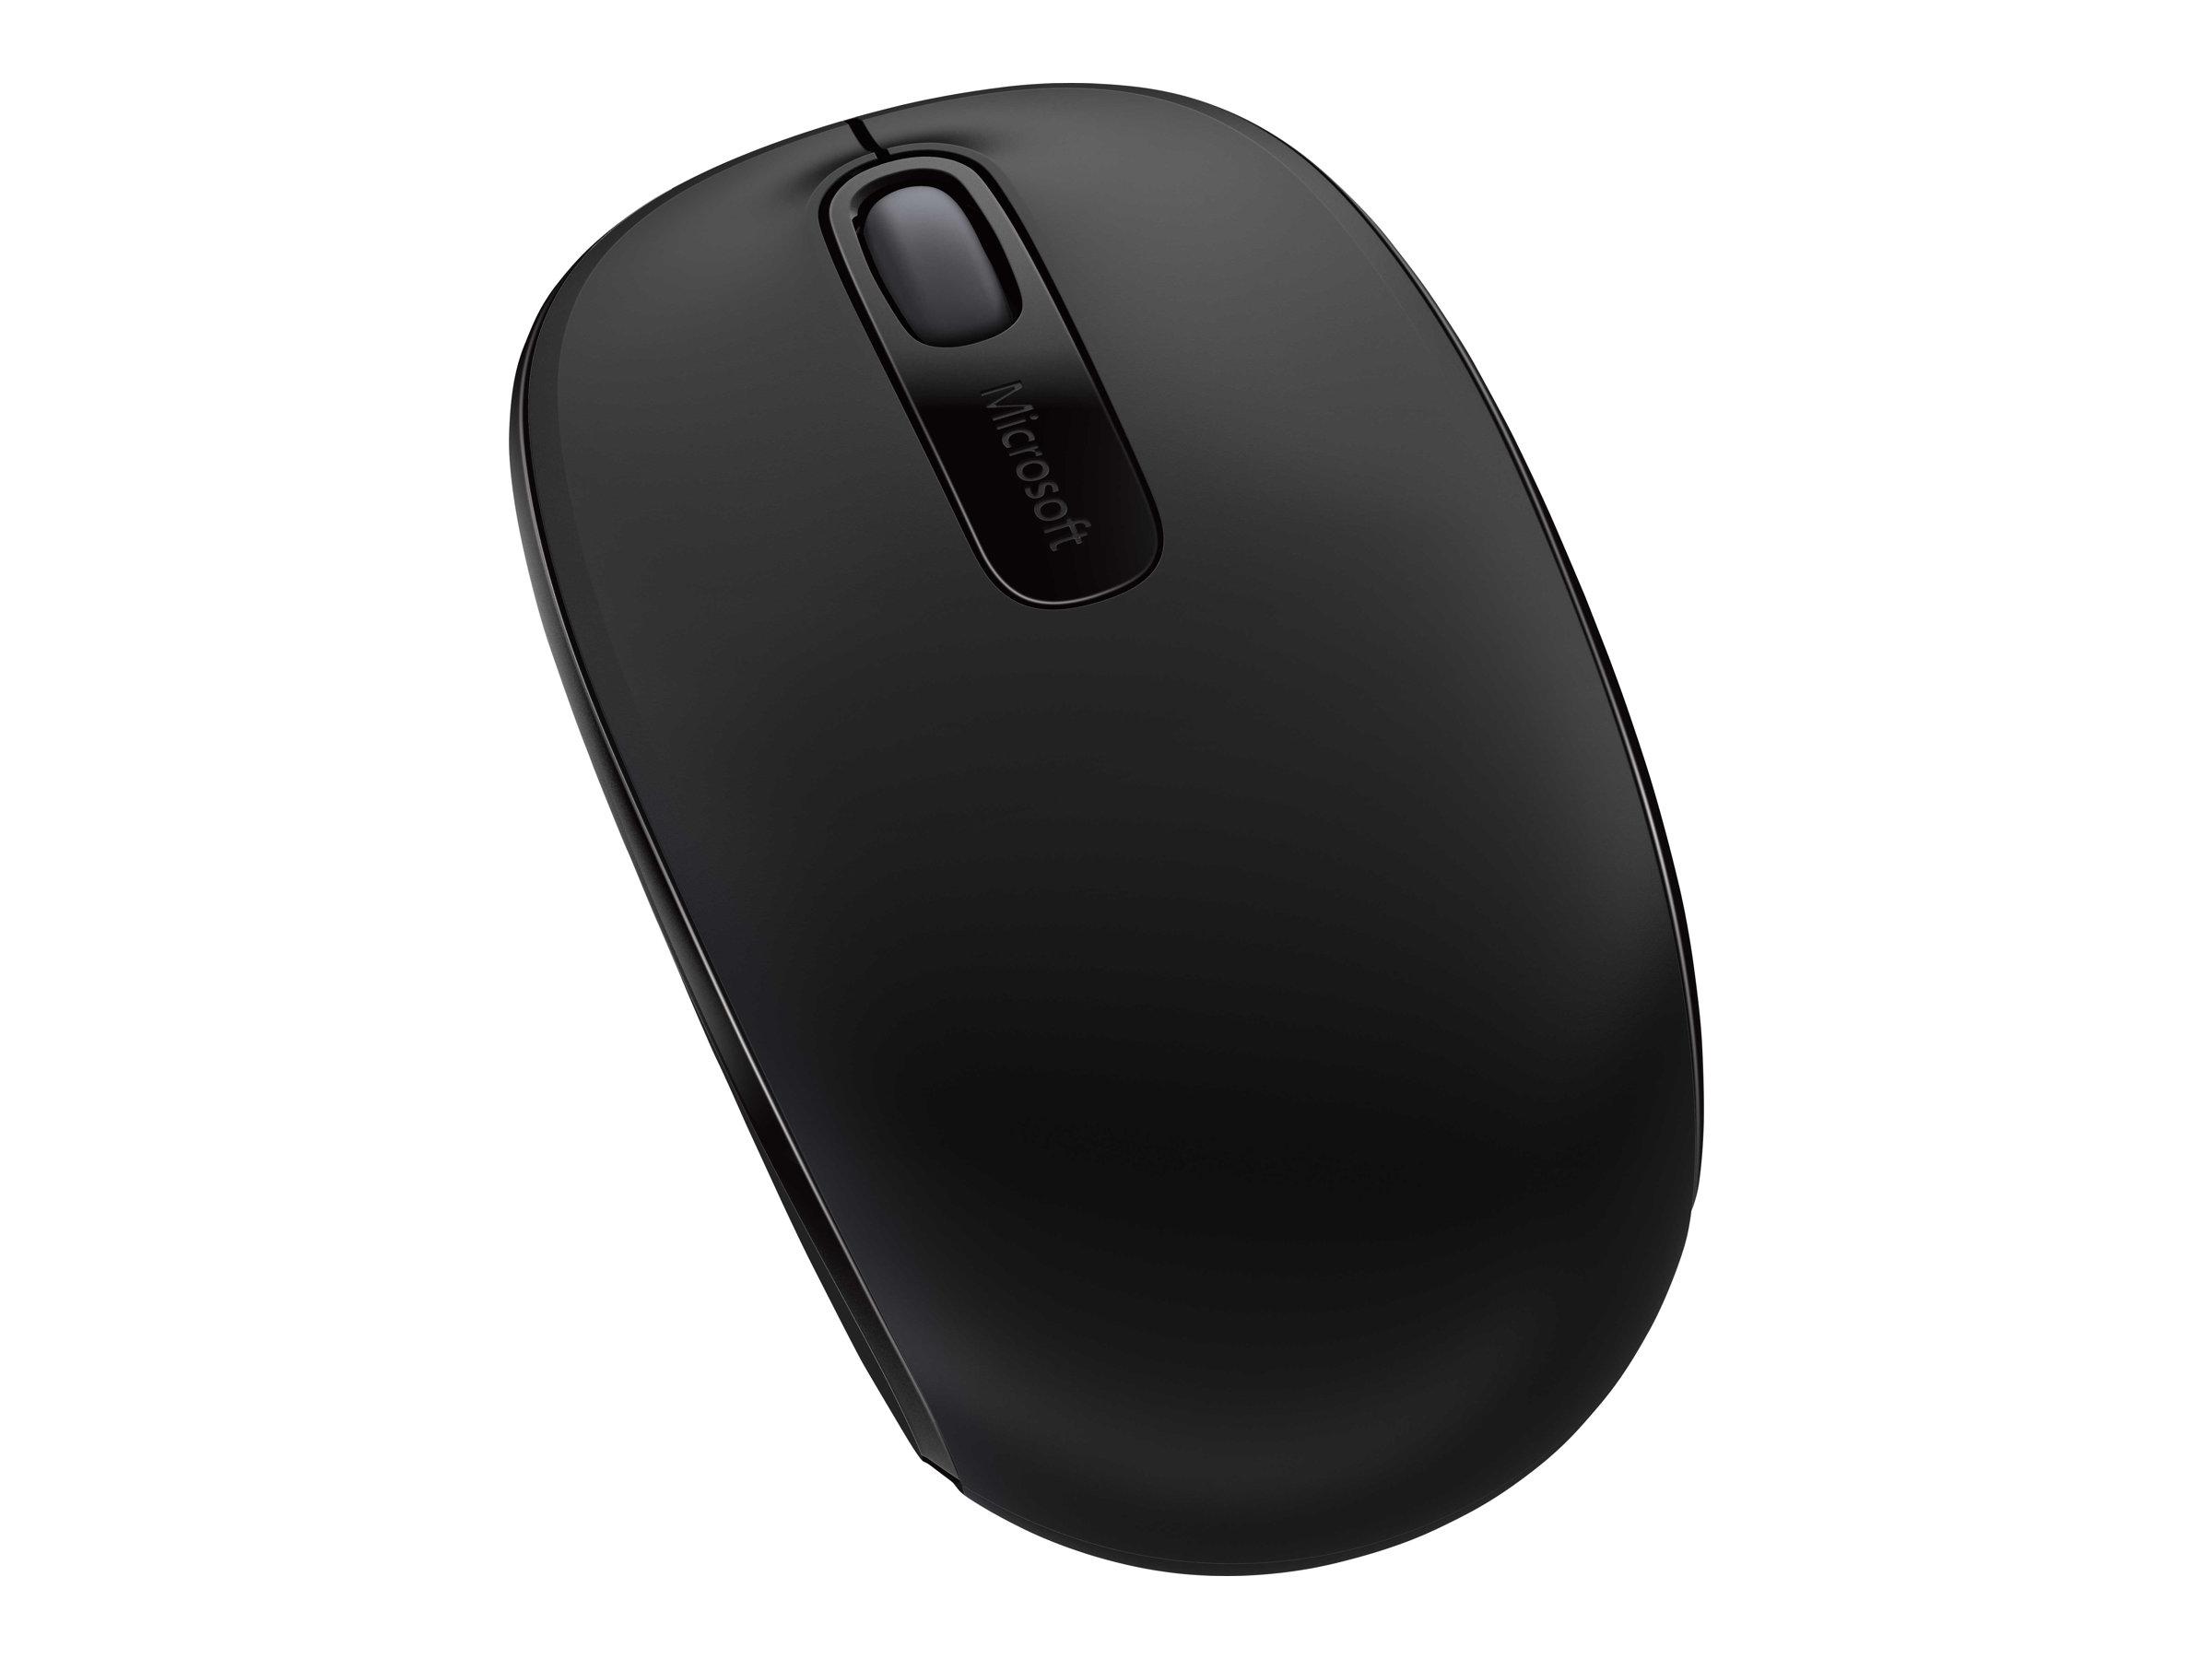 Wireless mobile mouse 1850 for business maus rechts und linkshaendig optisch 3 tasten kabellos 4395991 7mm 00002